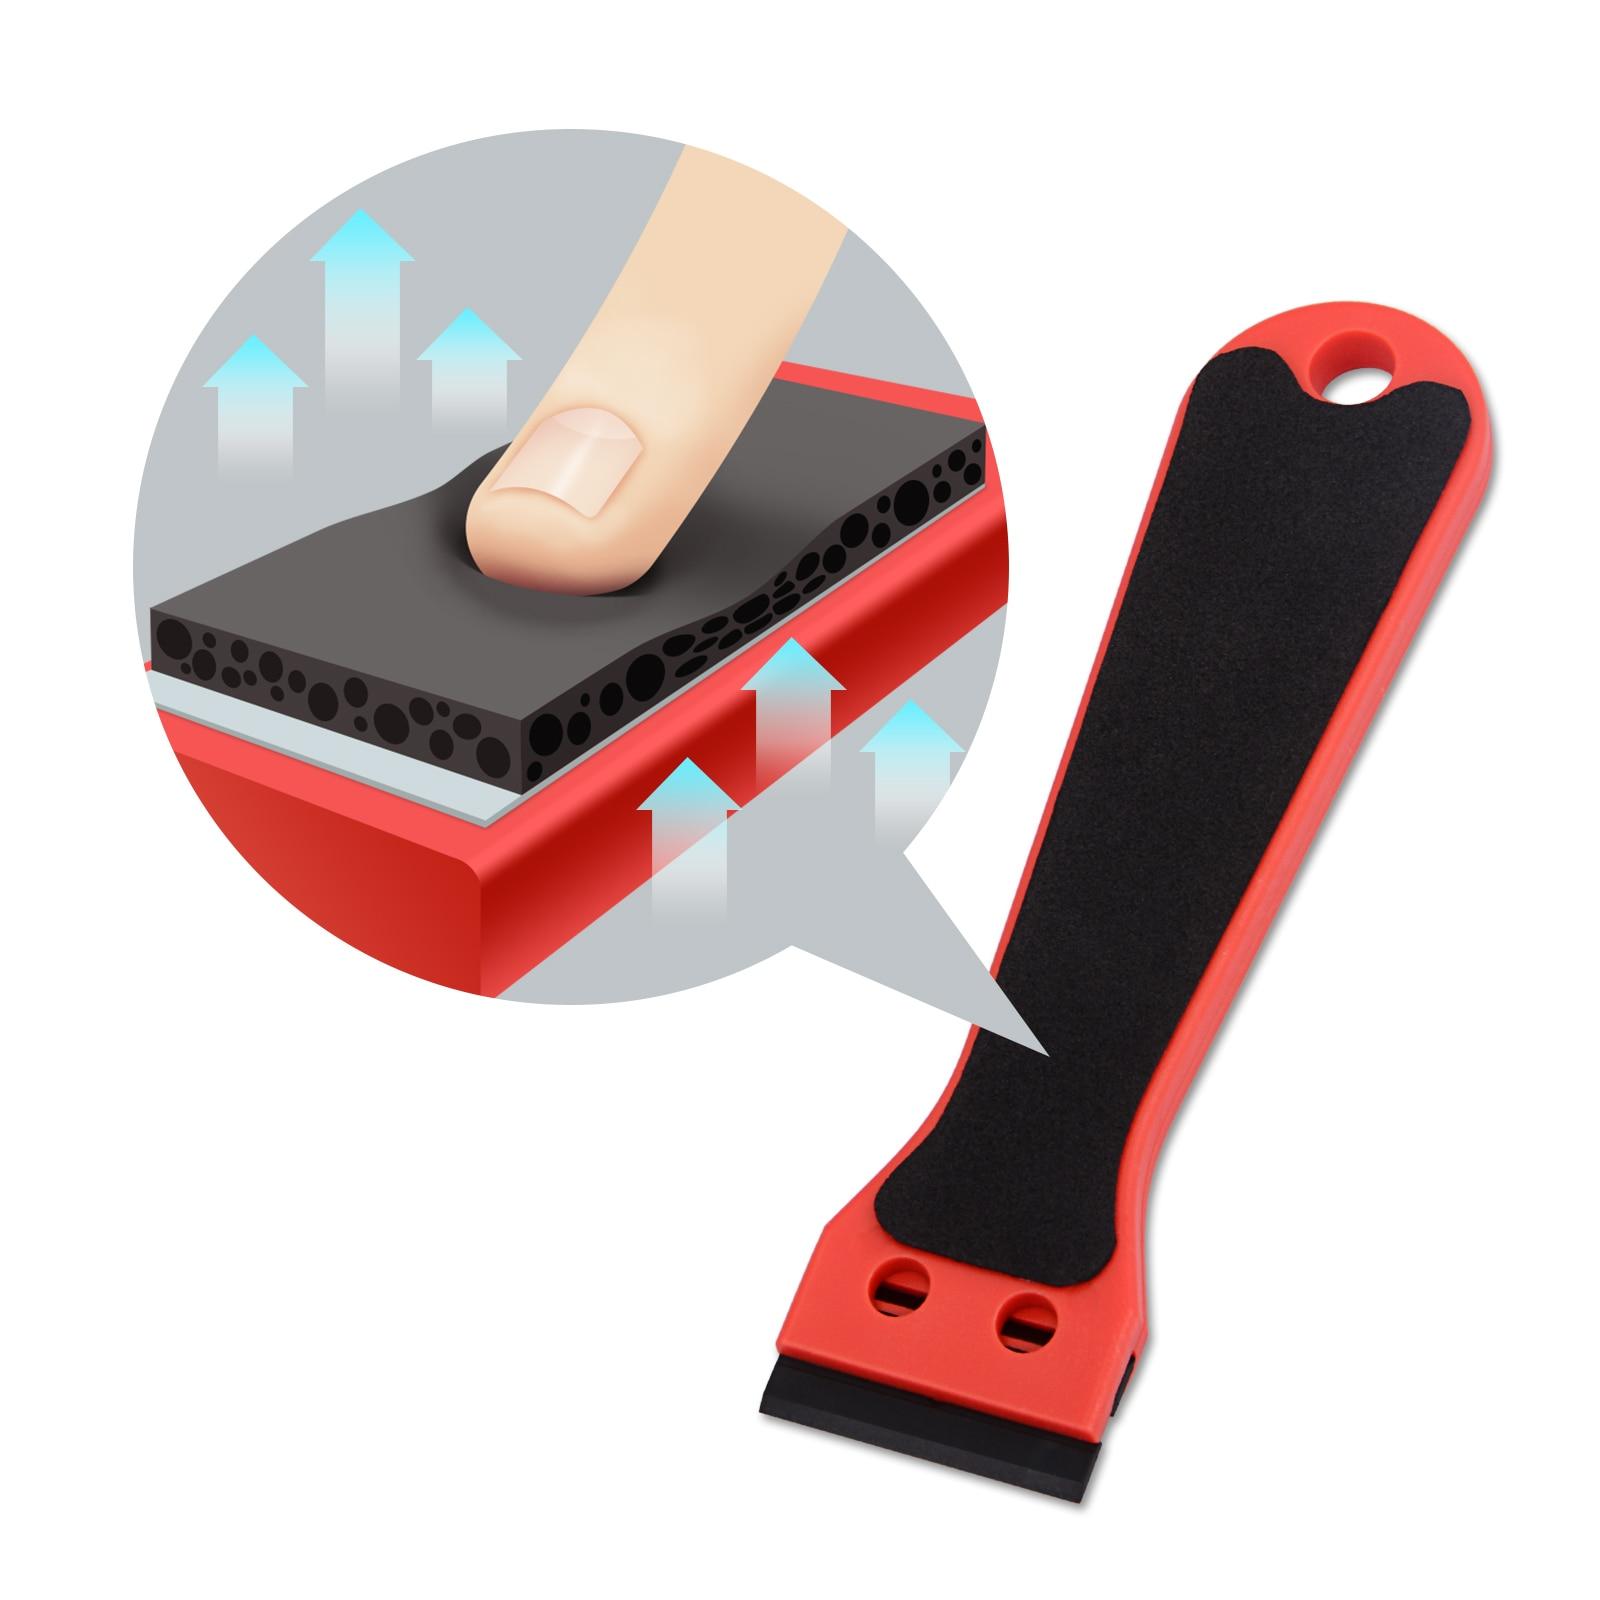 FOSHIO Vinyl Wrap Car Sticker Remover Razor Scraper For Oven Ceramic Window Glass Cleaning Carbon Fiber Wrapping Tool Squeegee